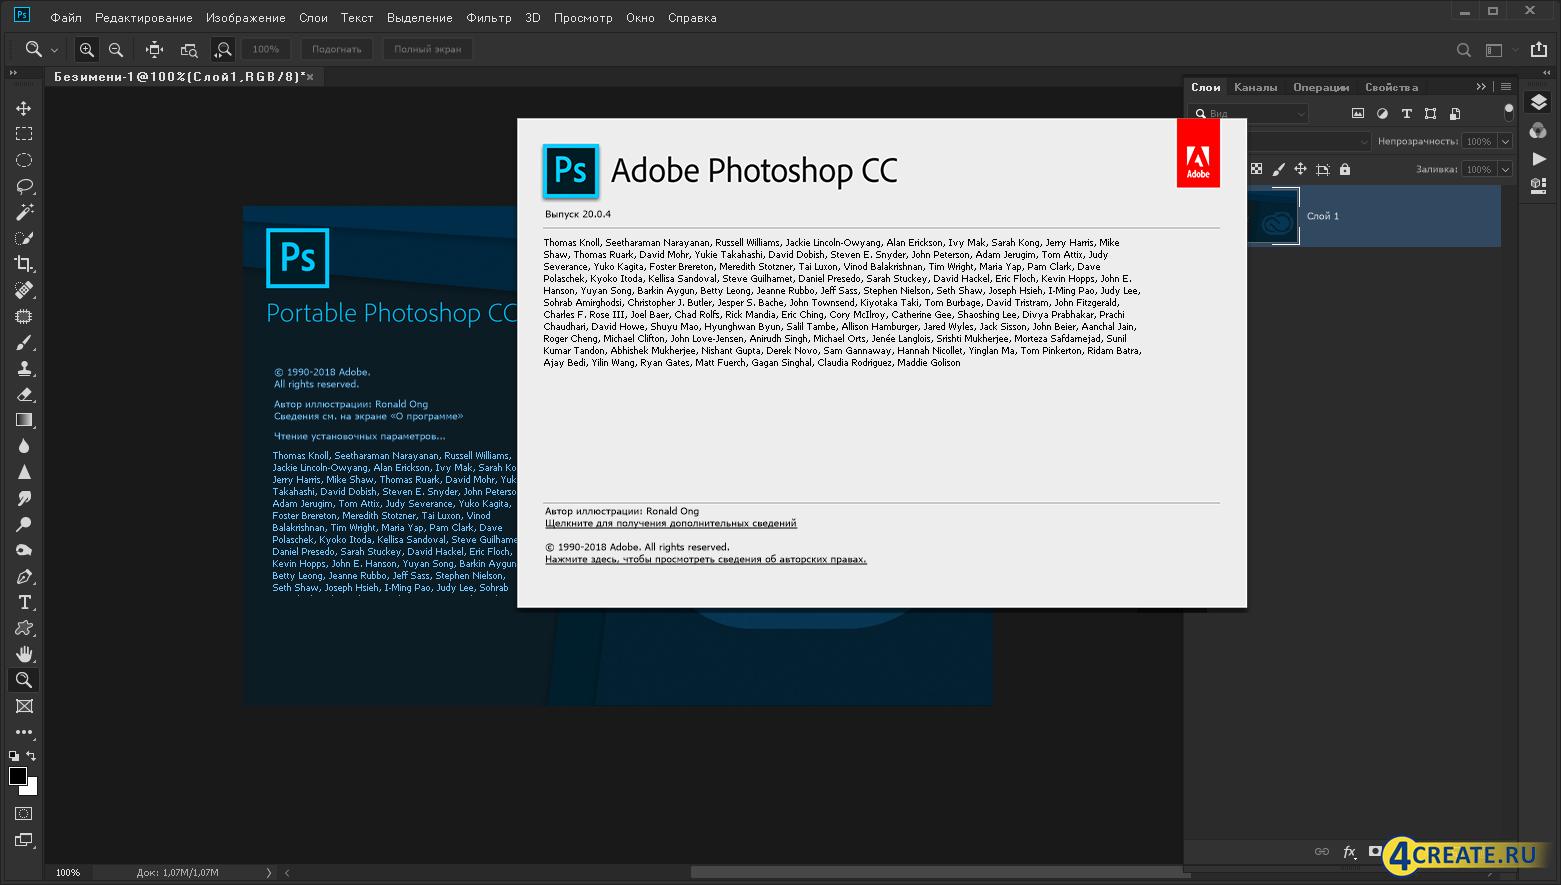 Adobe Photoshop CC 2019 (Скриншот 4)